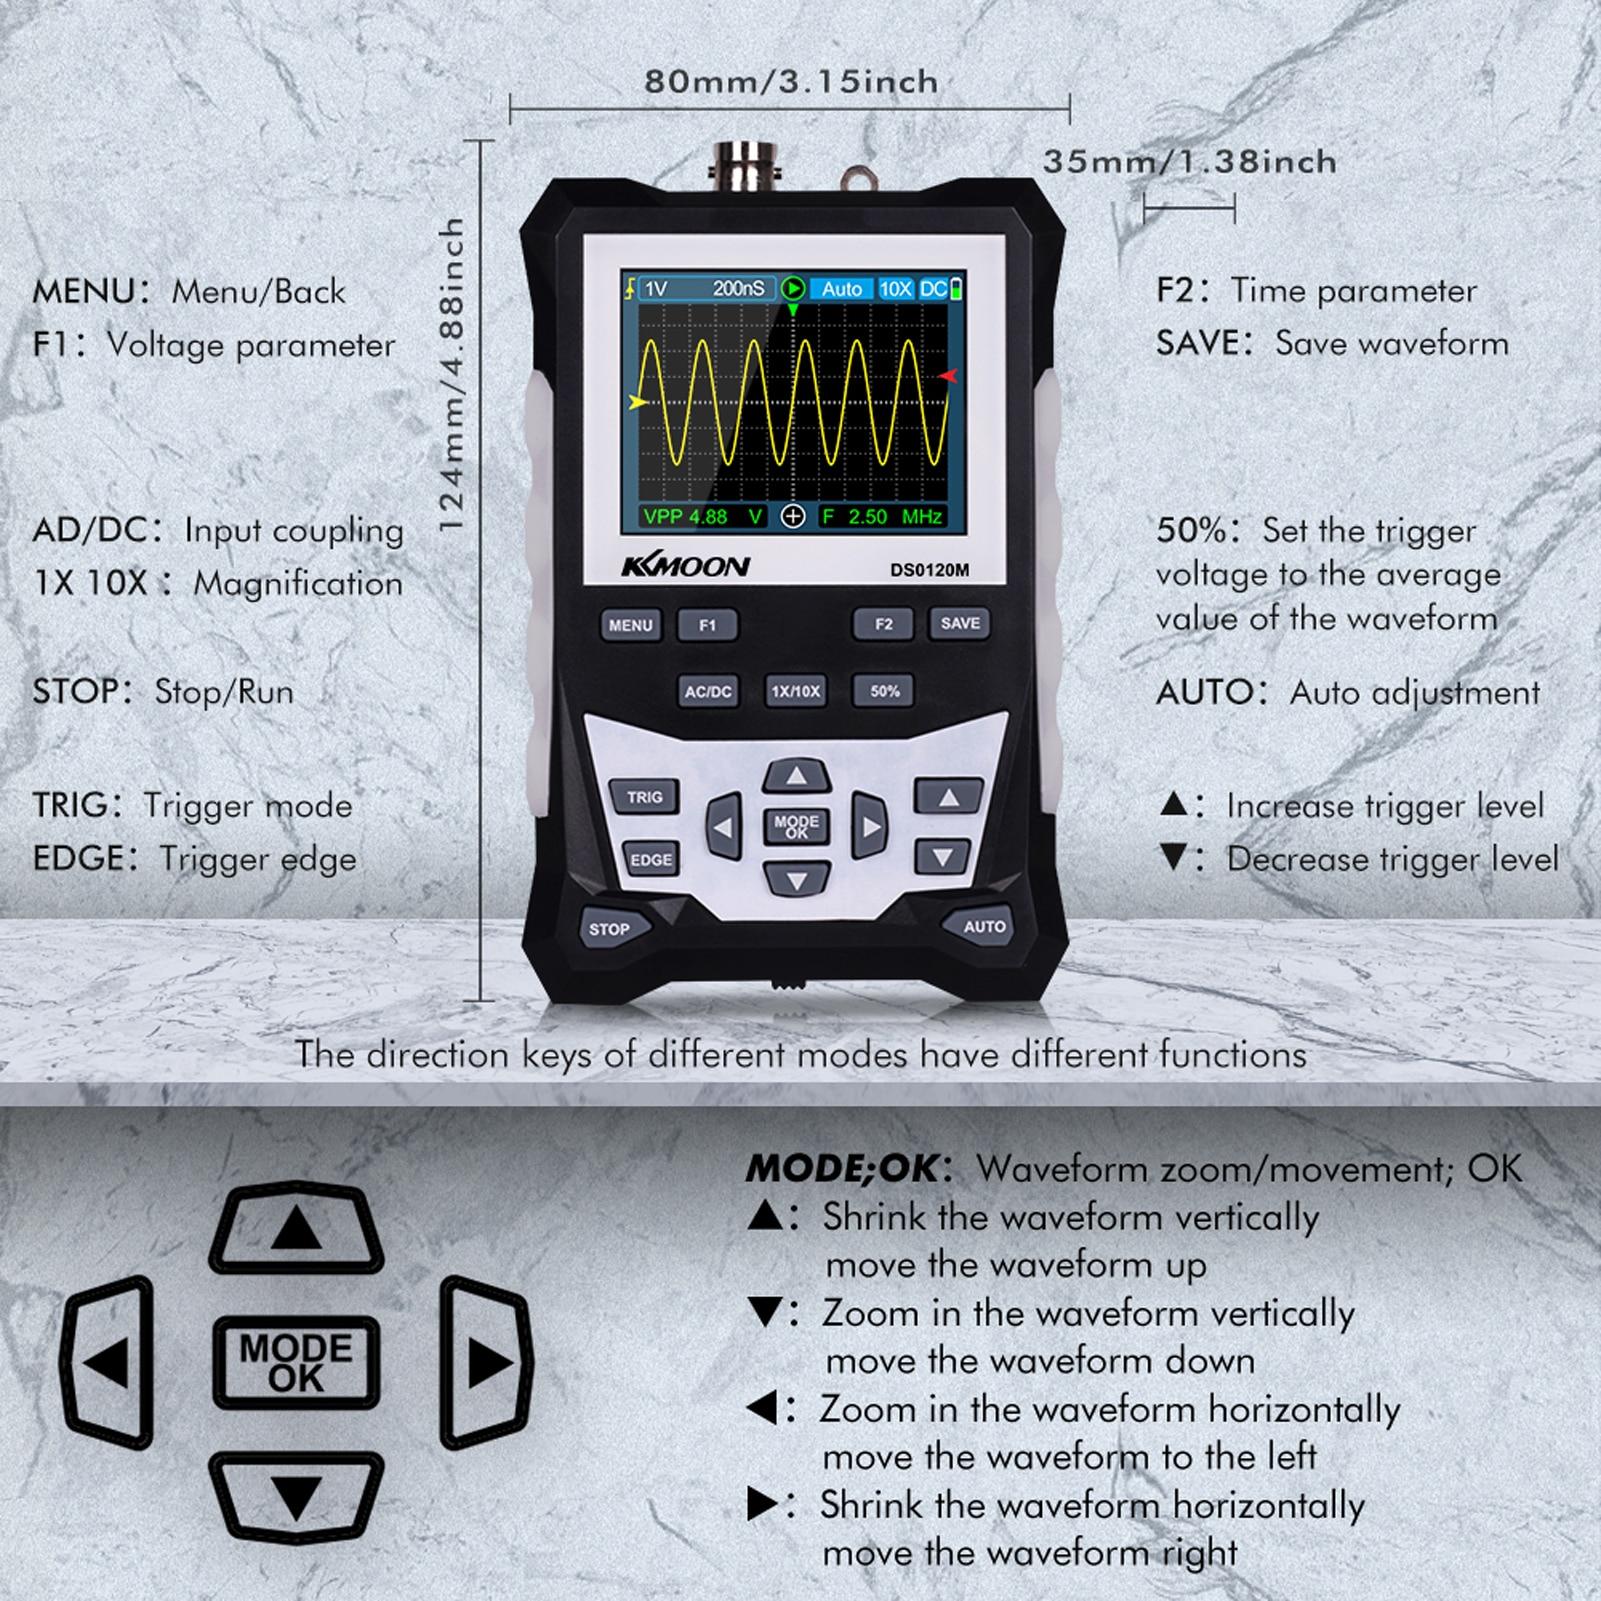 KKmoon Digitales Oszilloskop 120 MHz Bandbreite 500 MSa//s DS0120M 320x240 High Definition 2,4-Zoll-TFT-Farbbildschirm Sampling Rate Professional Tool mit Wellenformspeicher Hintergrundbeleuchtung